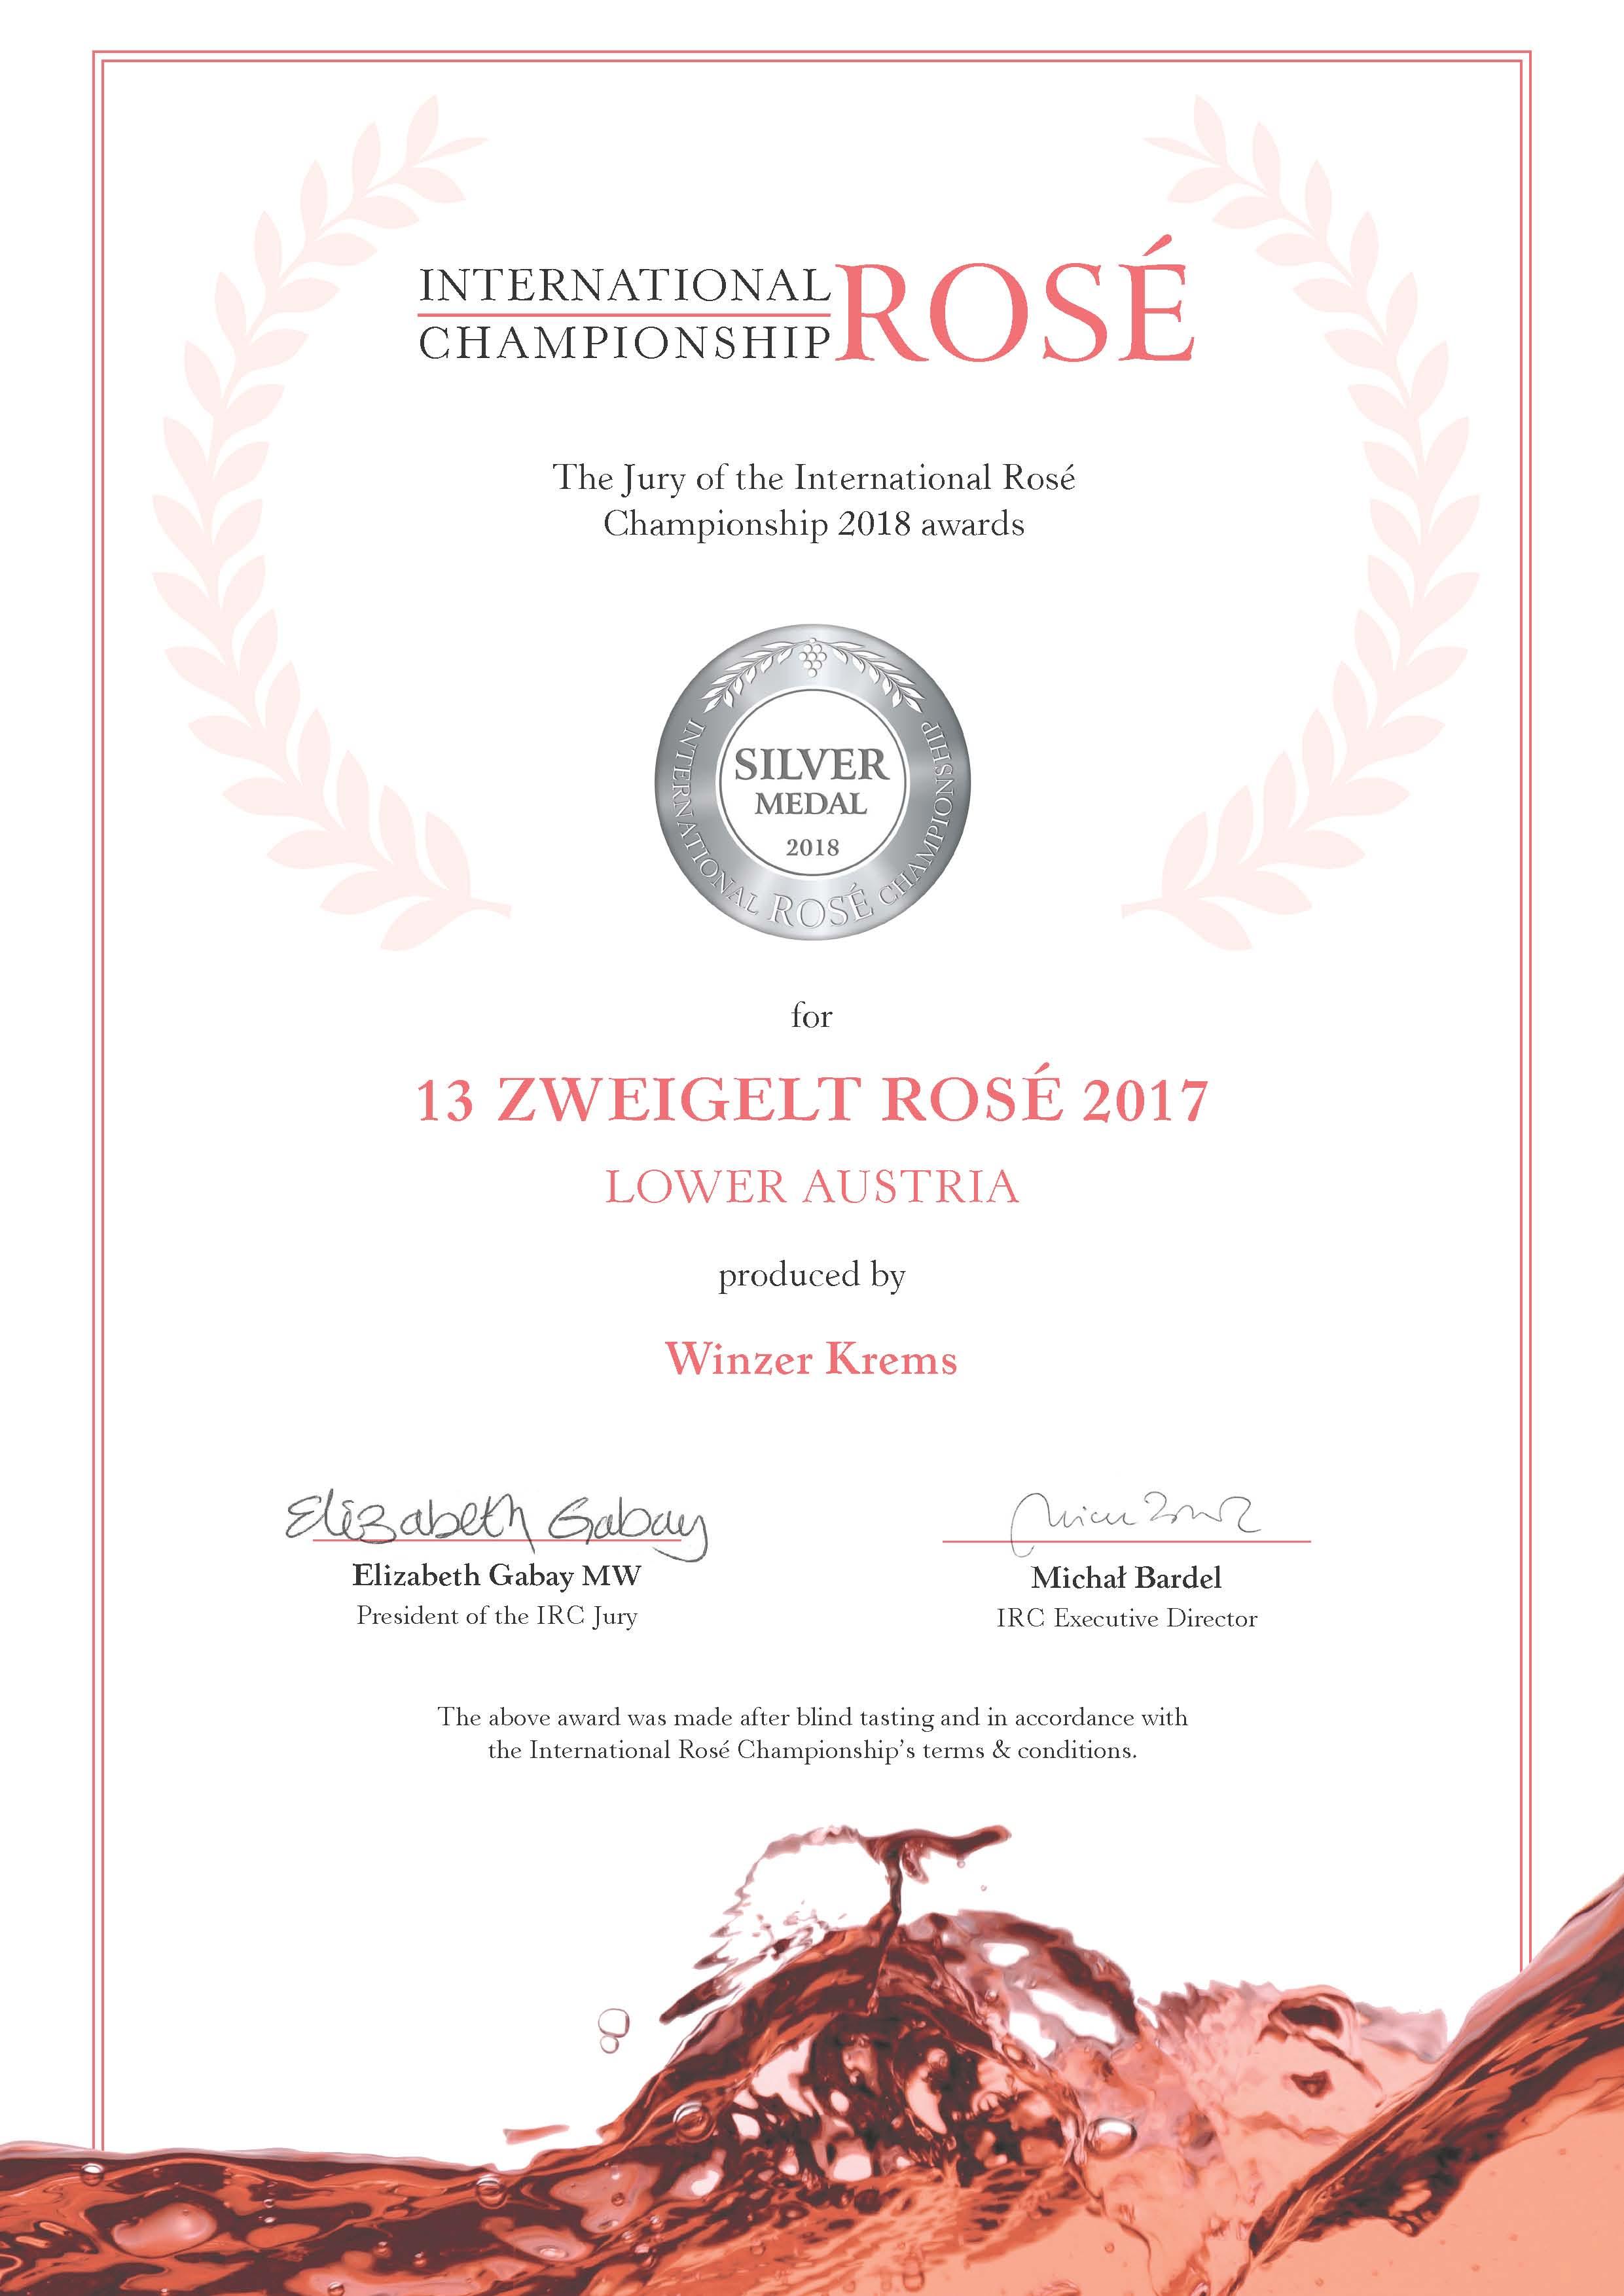 April 2018: Silbermedaille bei der International Rosé Championship 2018 für Jahrgang 2017